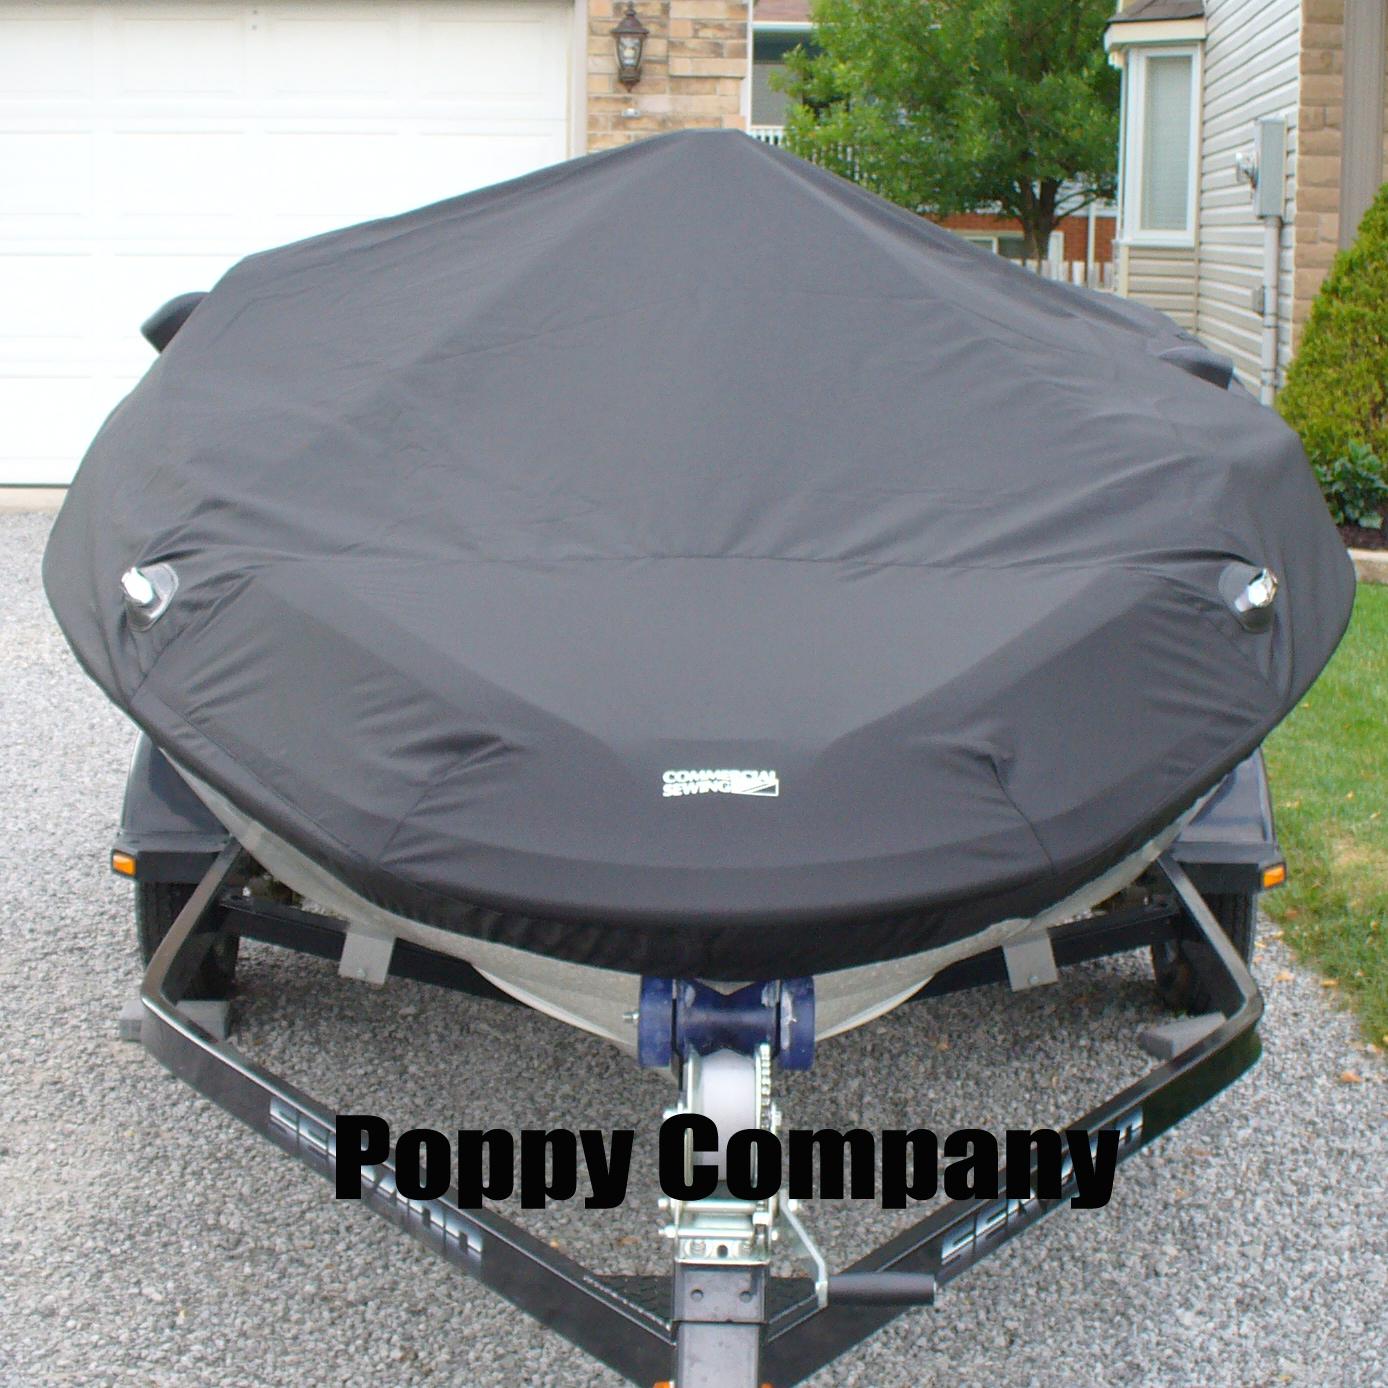 Poppy Company Seadoo Speedster 150 Cover